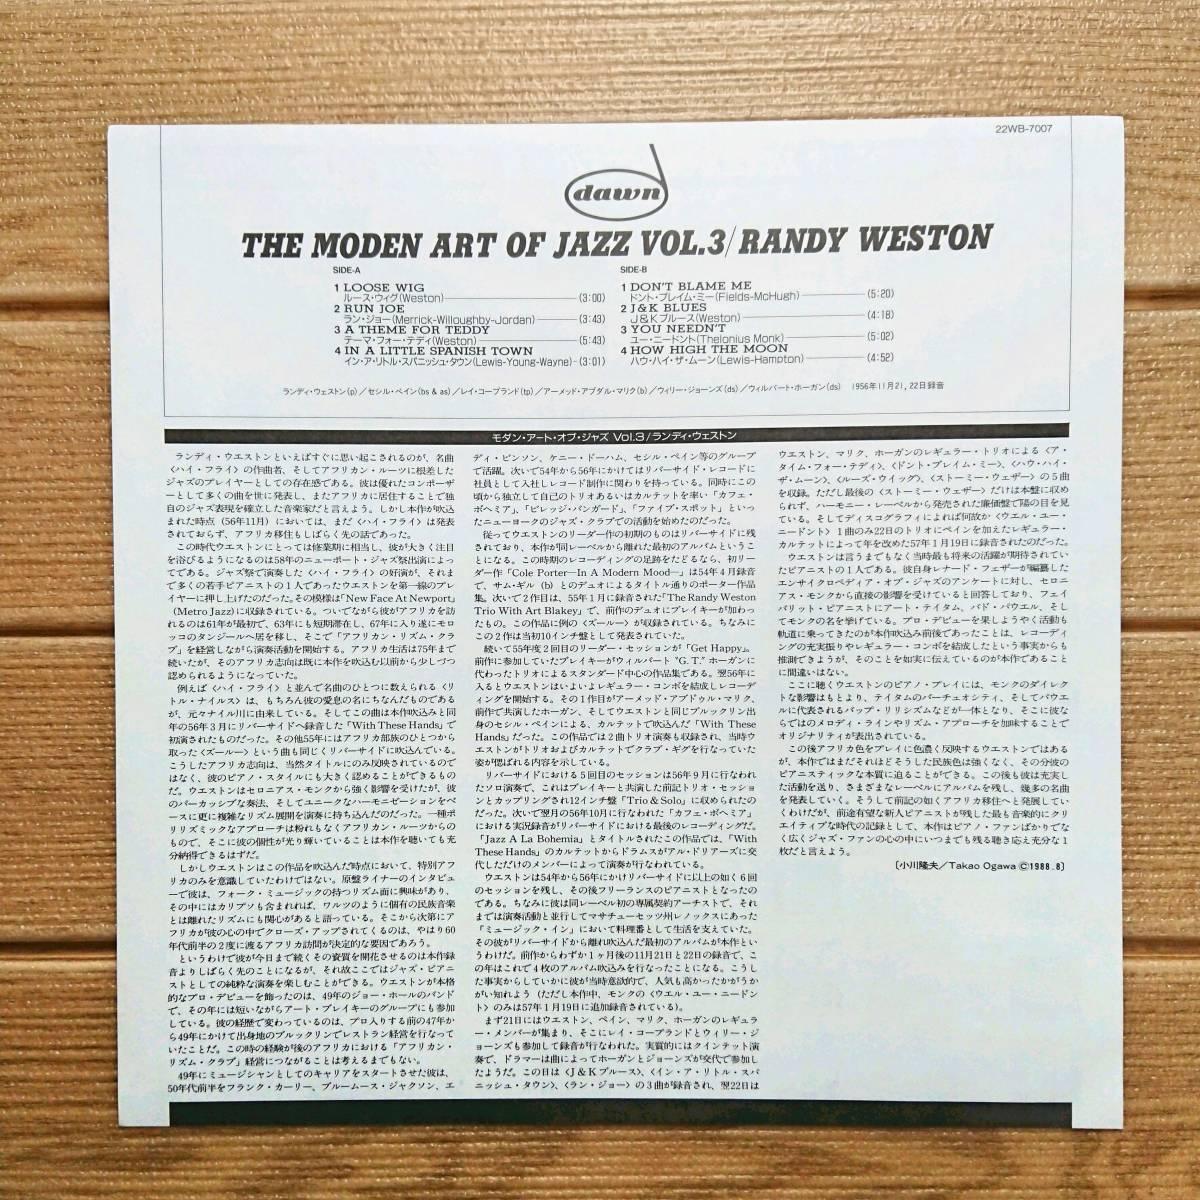 Randy Weston(p)/The Modern Art Of Jazz Vol.3 ランディ・ウエストン(p)/モダン・アート・オブ・ジャズ Vol.3【国内帯付重量盤美盤】_画像4